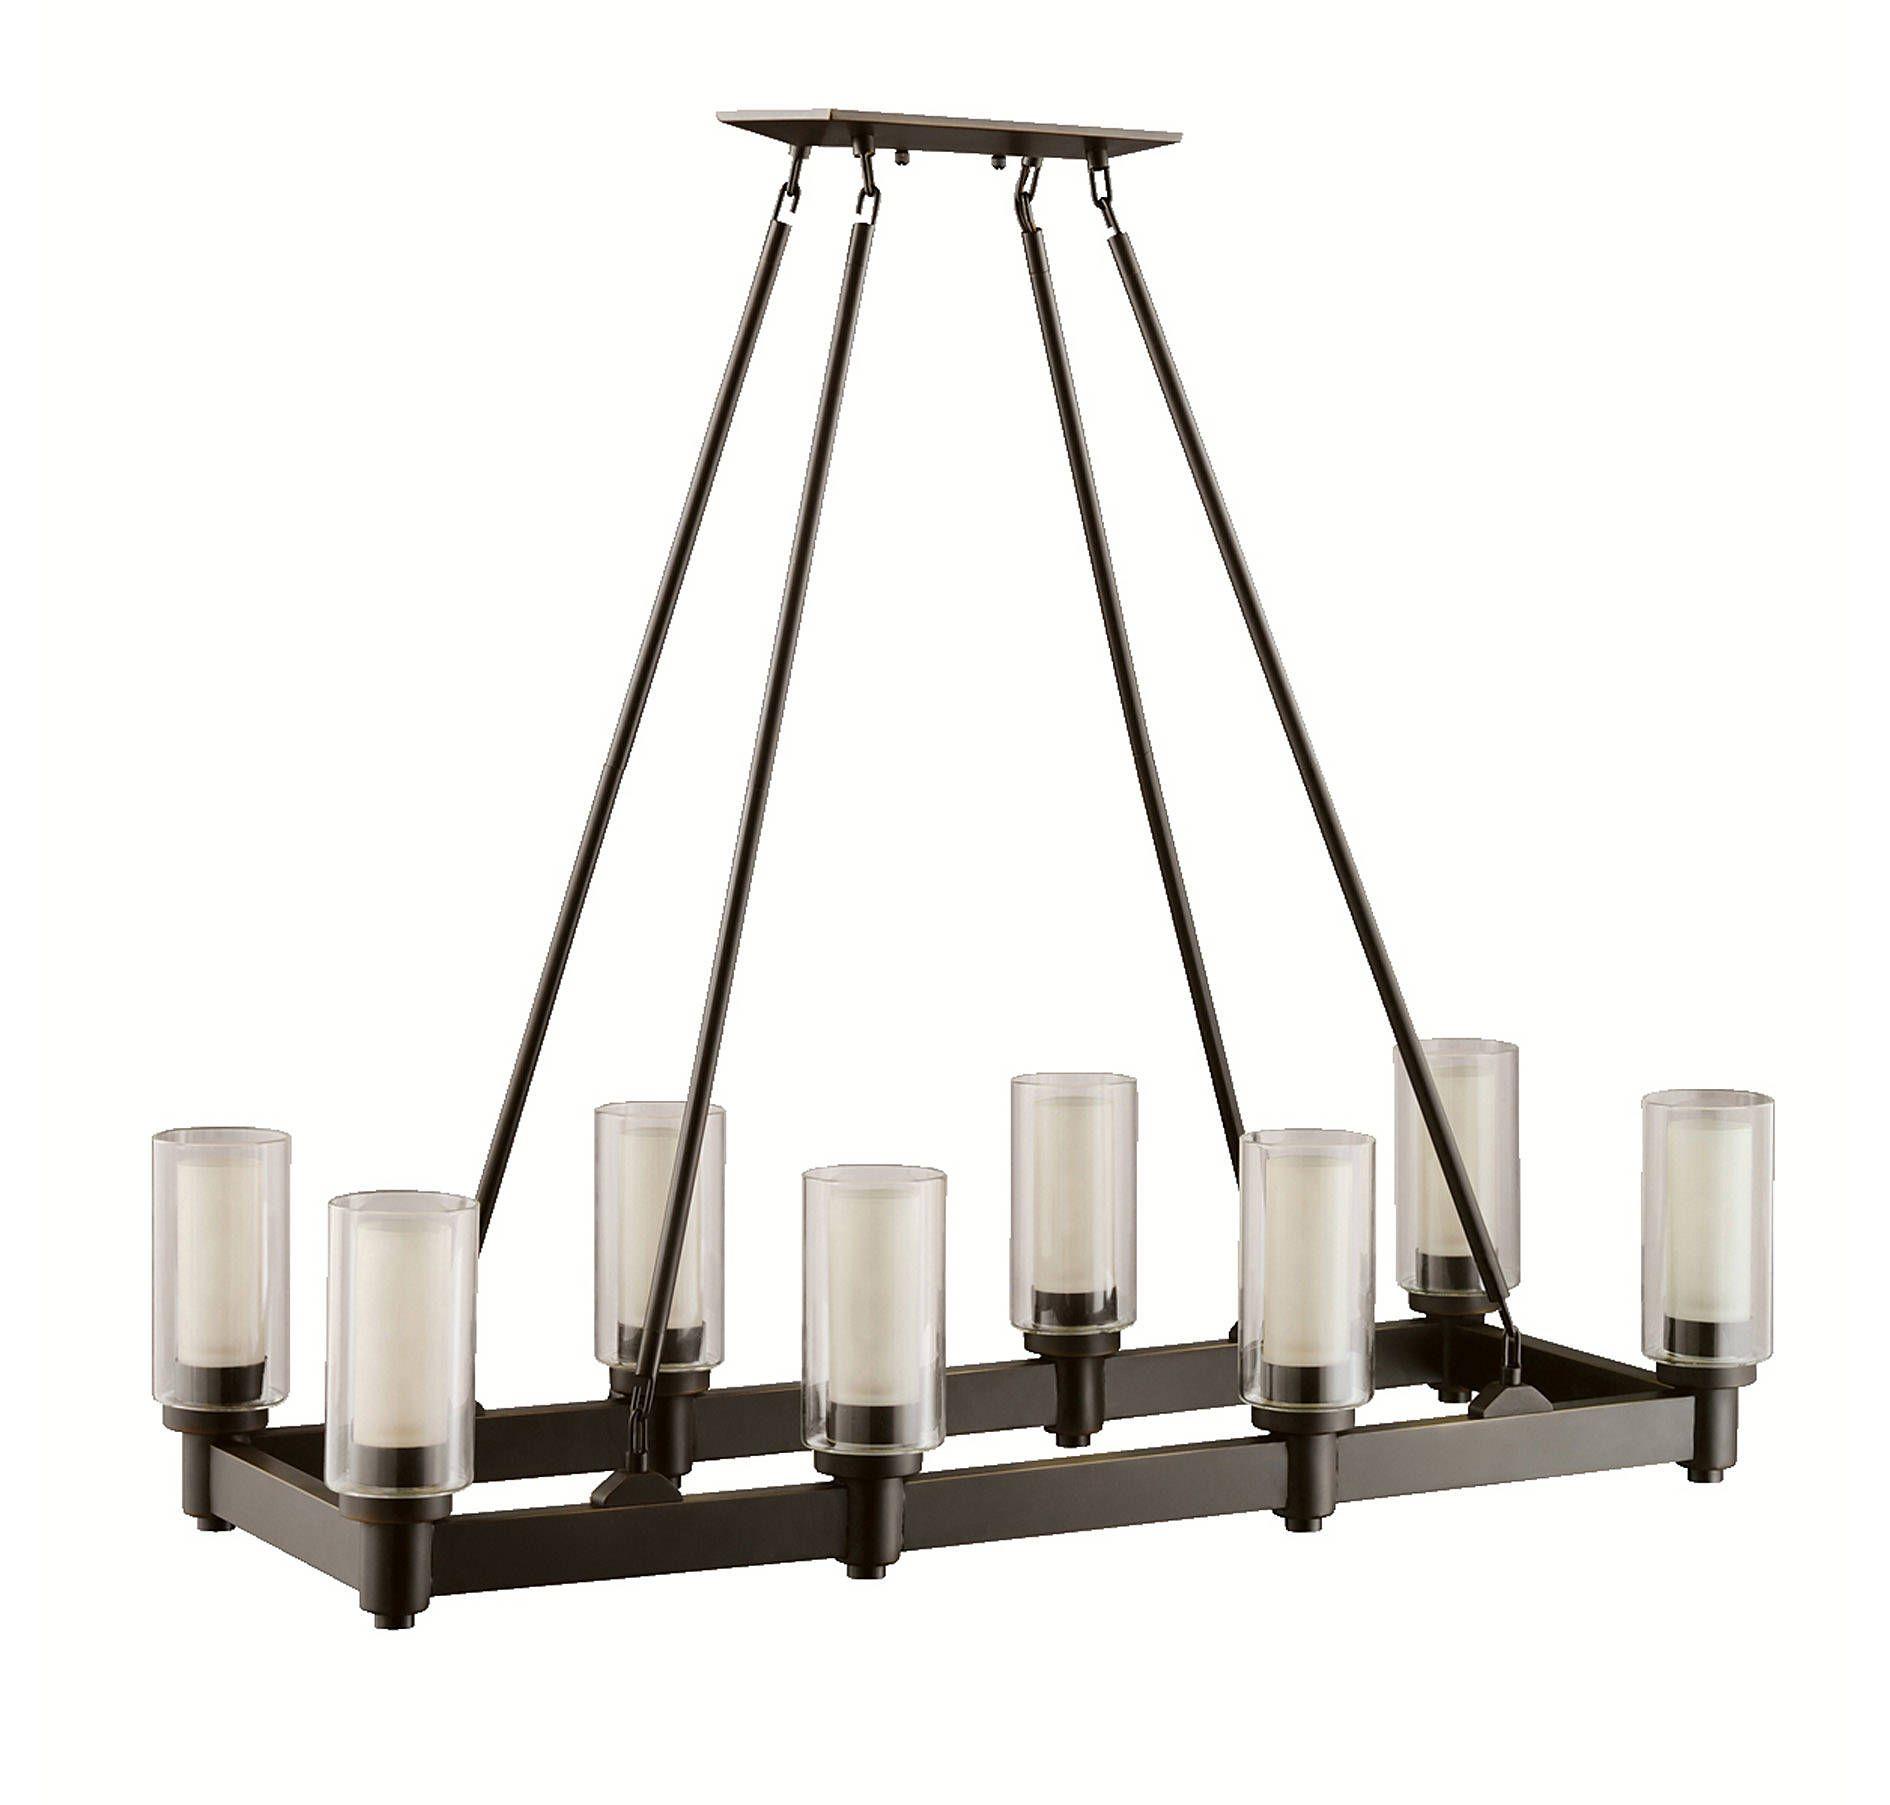 Kichler 2943oz circolo 8 light chandelier in olde bronze in ceiling kichler 2943oz circolo 8 light chandelier in olde bronze in ceiling lights chandeliers aloadofball Choice Image